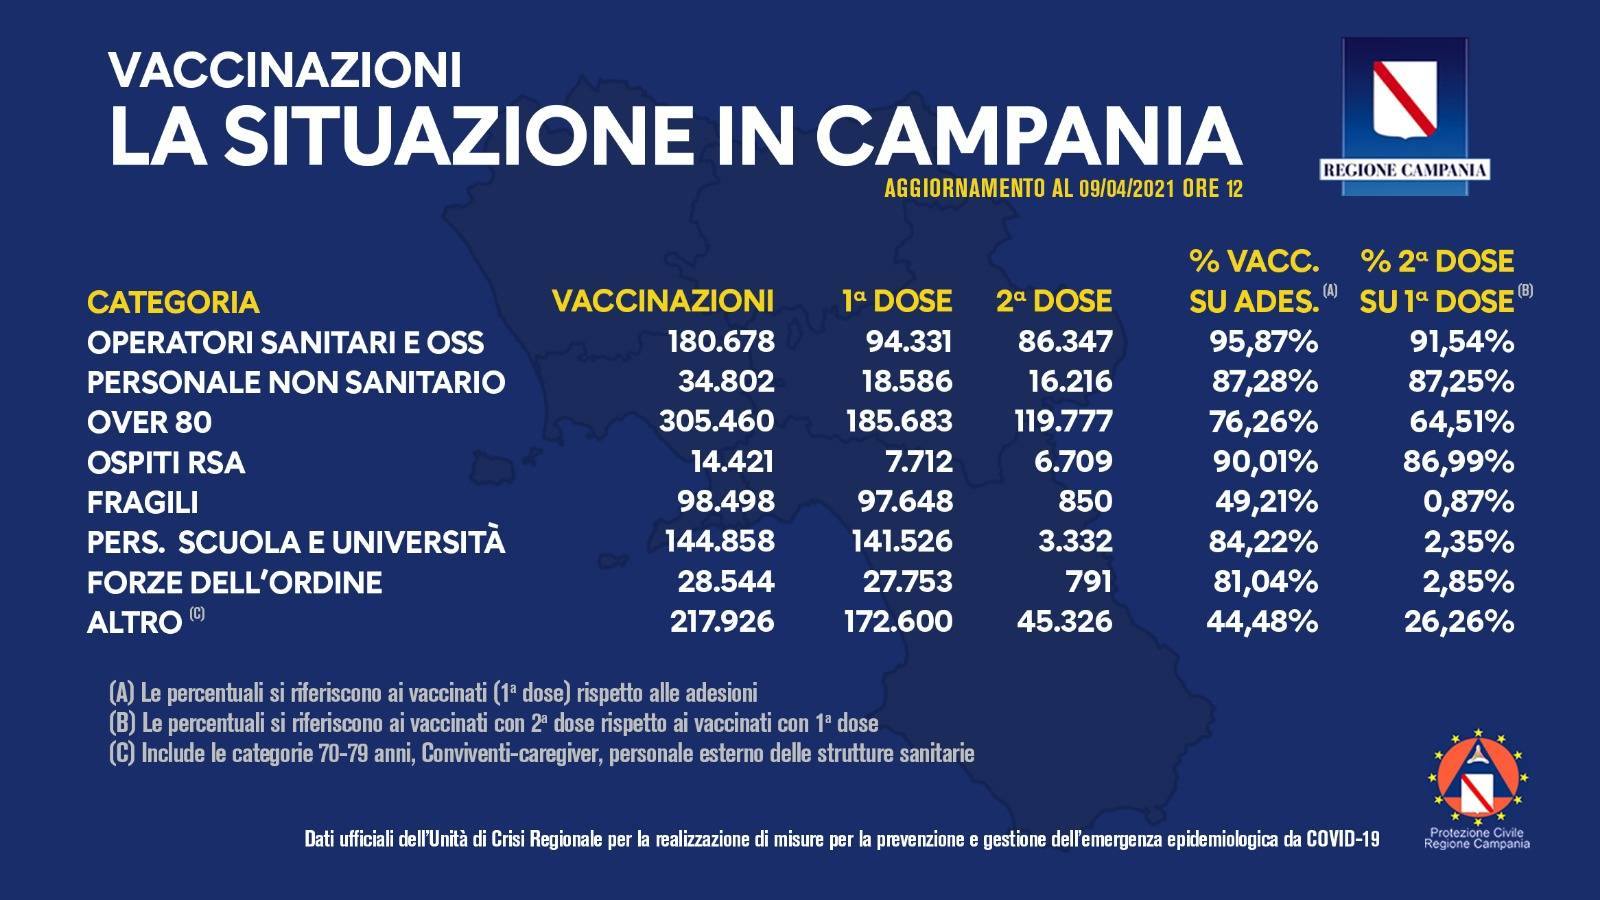 Campagna vaccinale campania 9 aprile